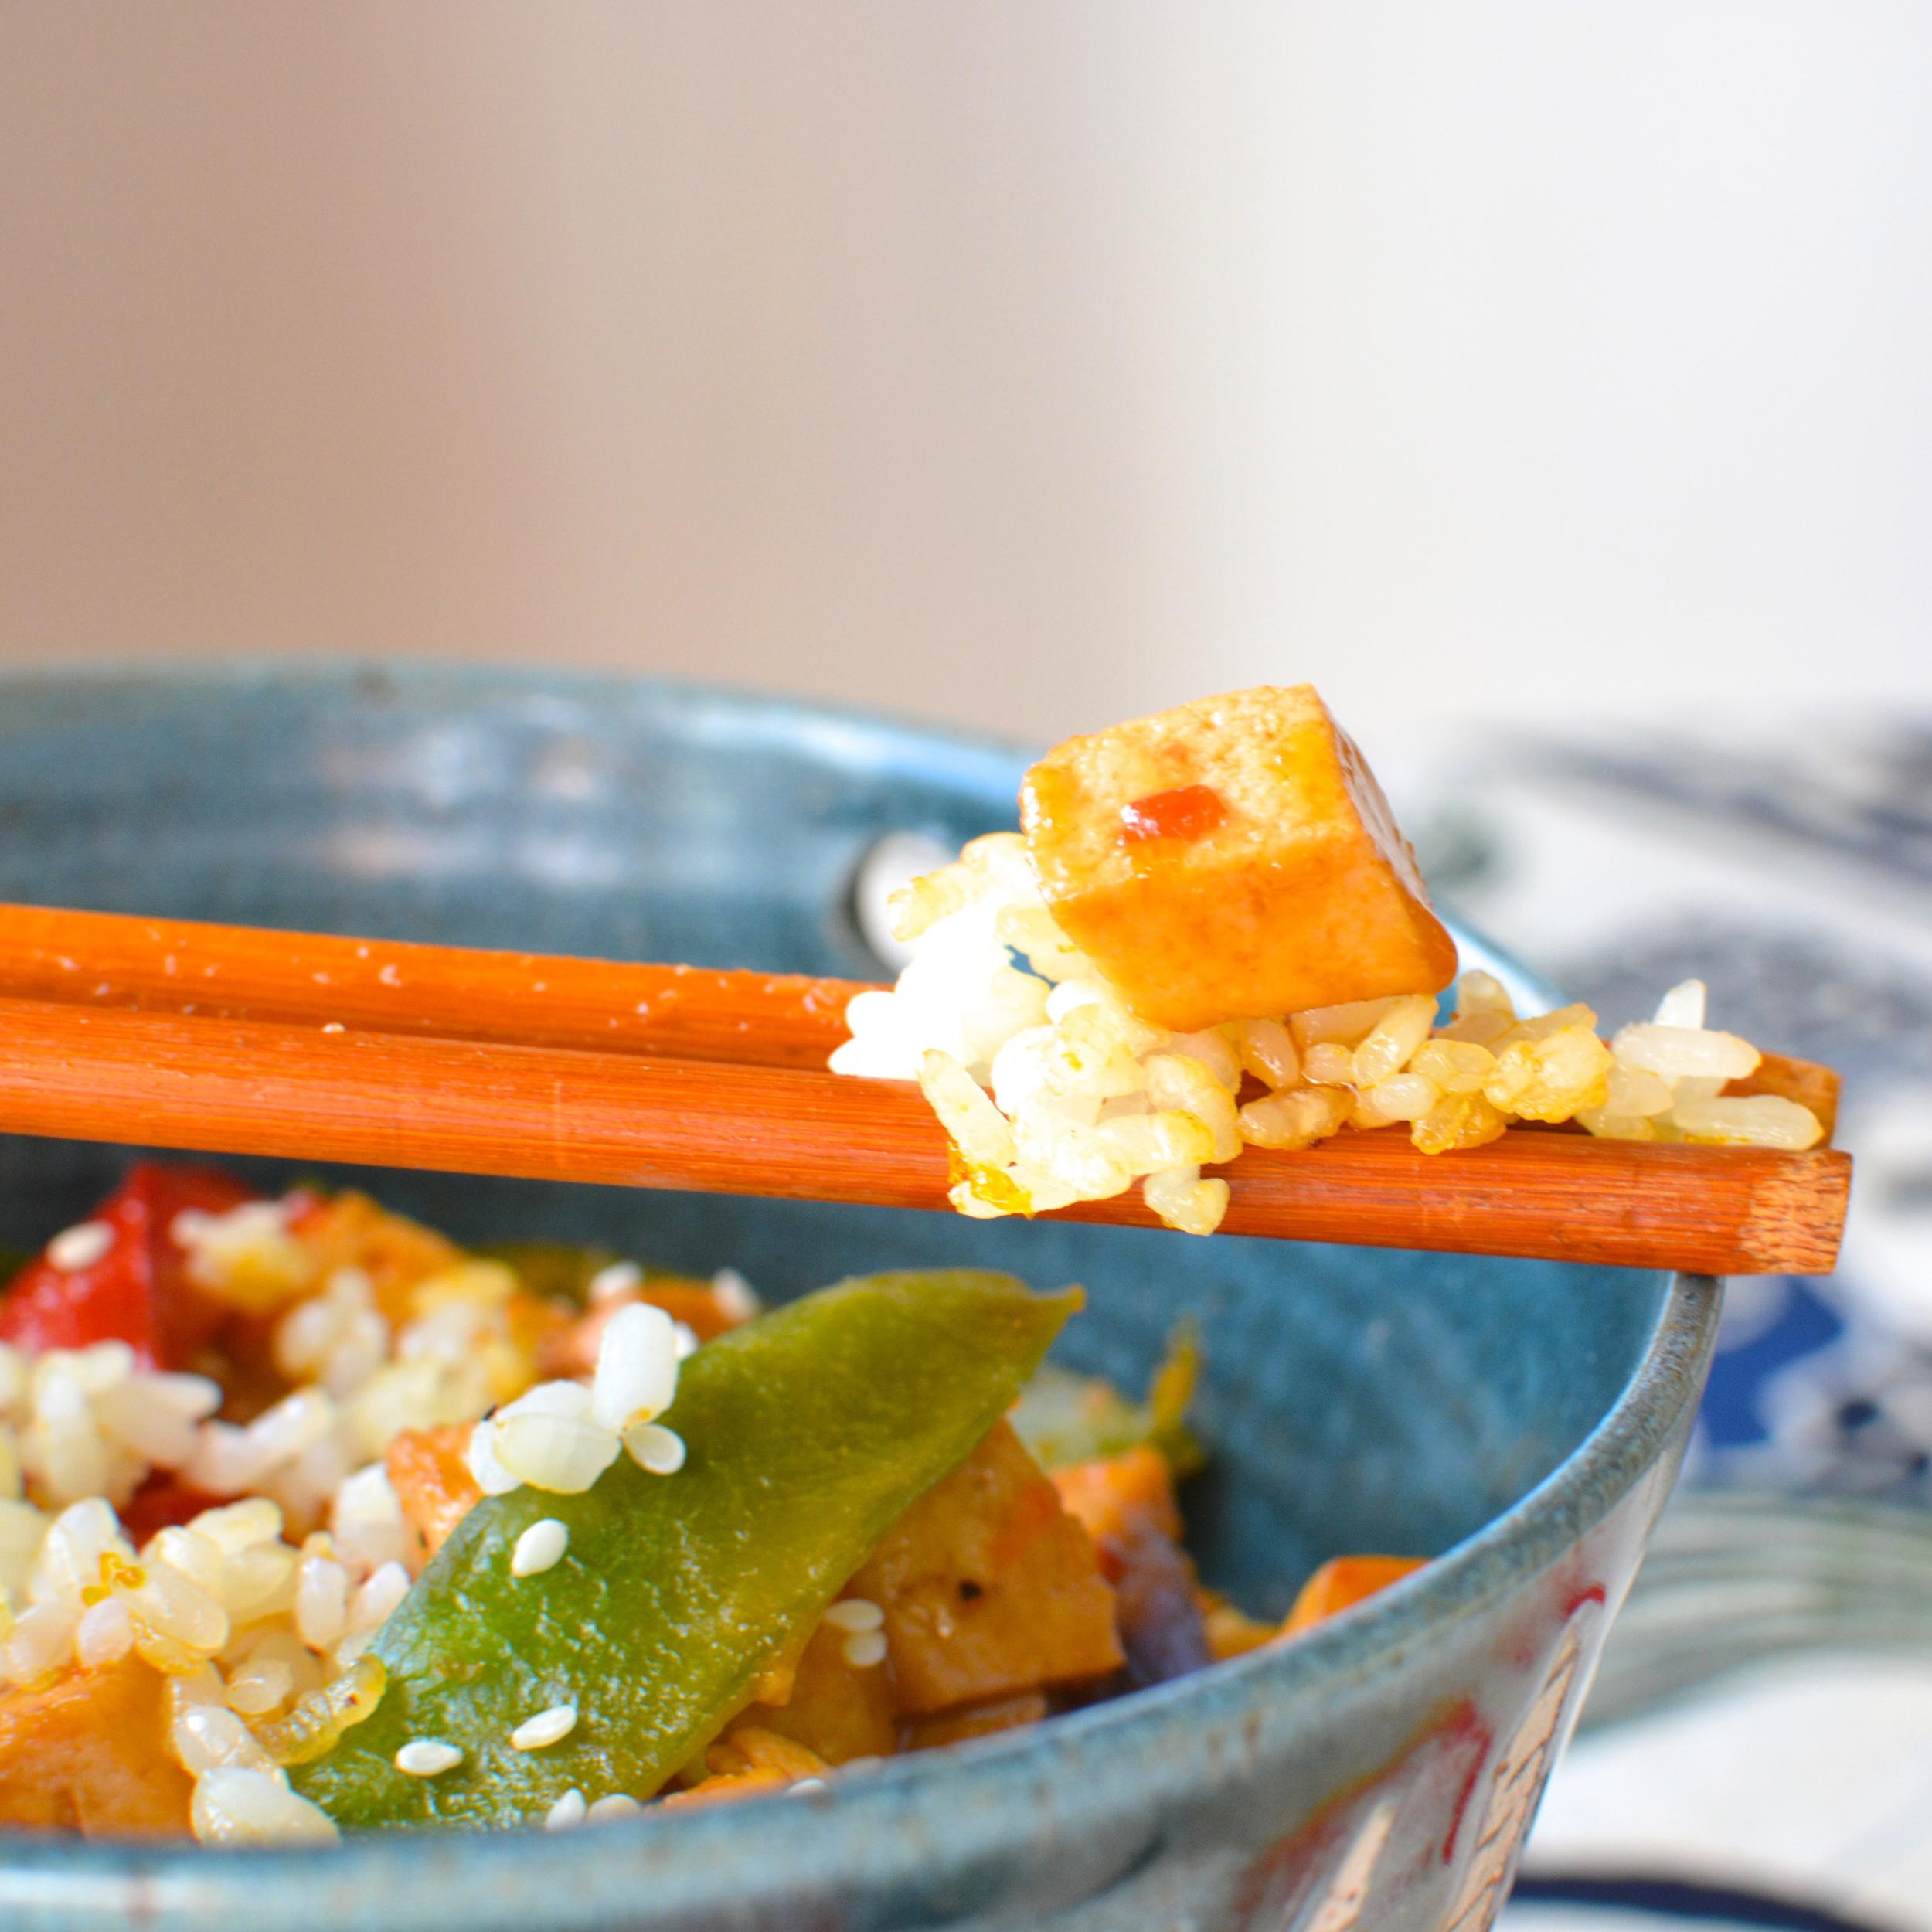 Orange Tofu and Veggies with Crispy Sesame Orange Sushi Rice